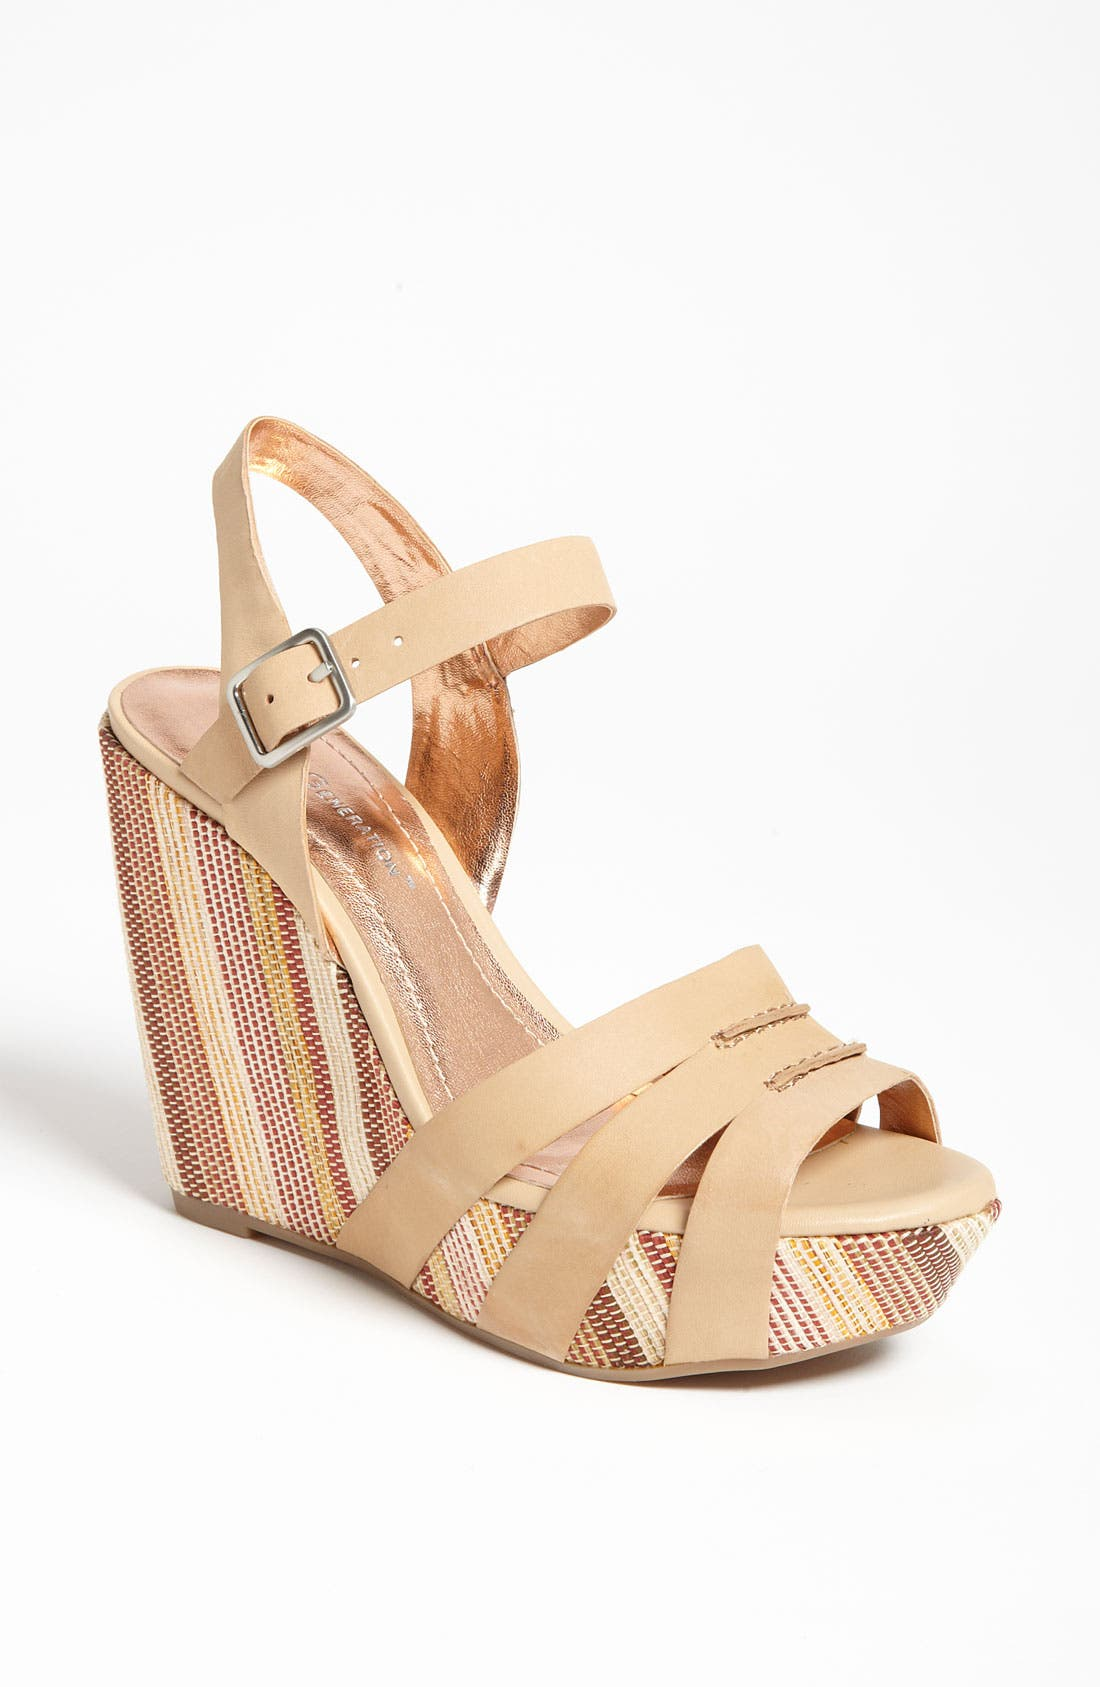 Main Image - BCBGeneration 'Perrin' Sandal